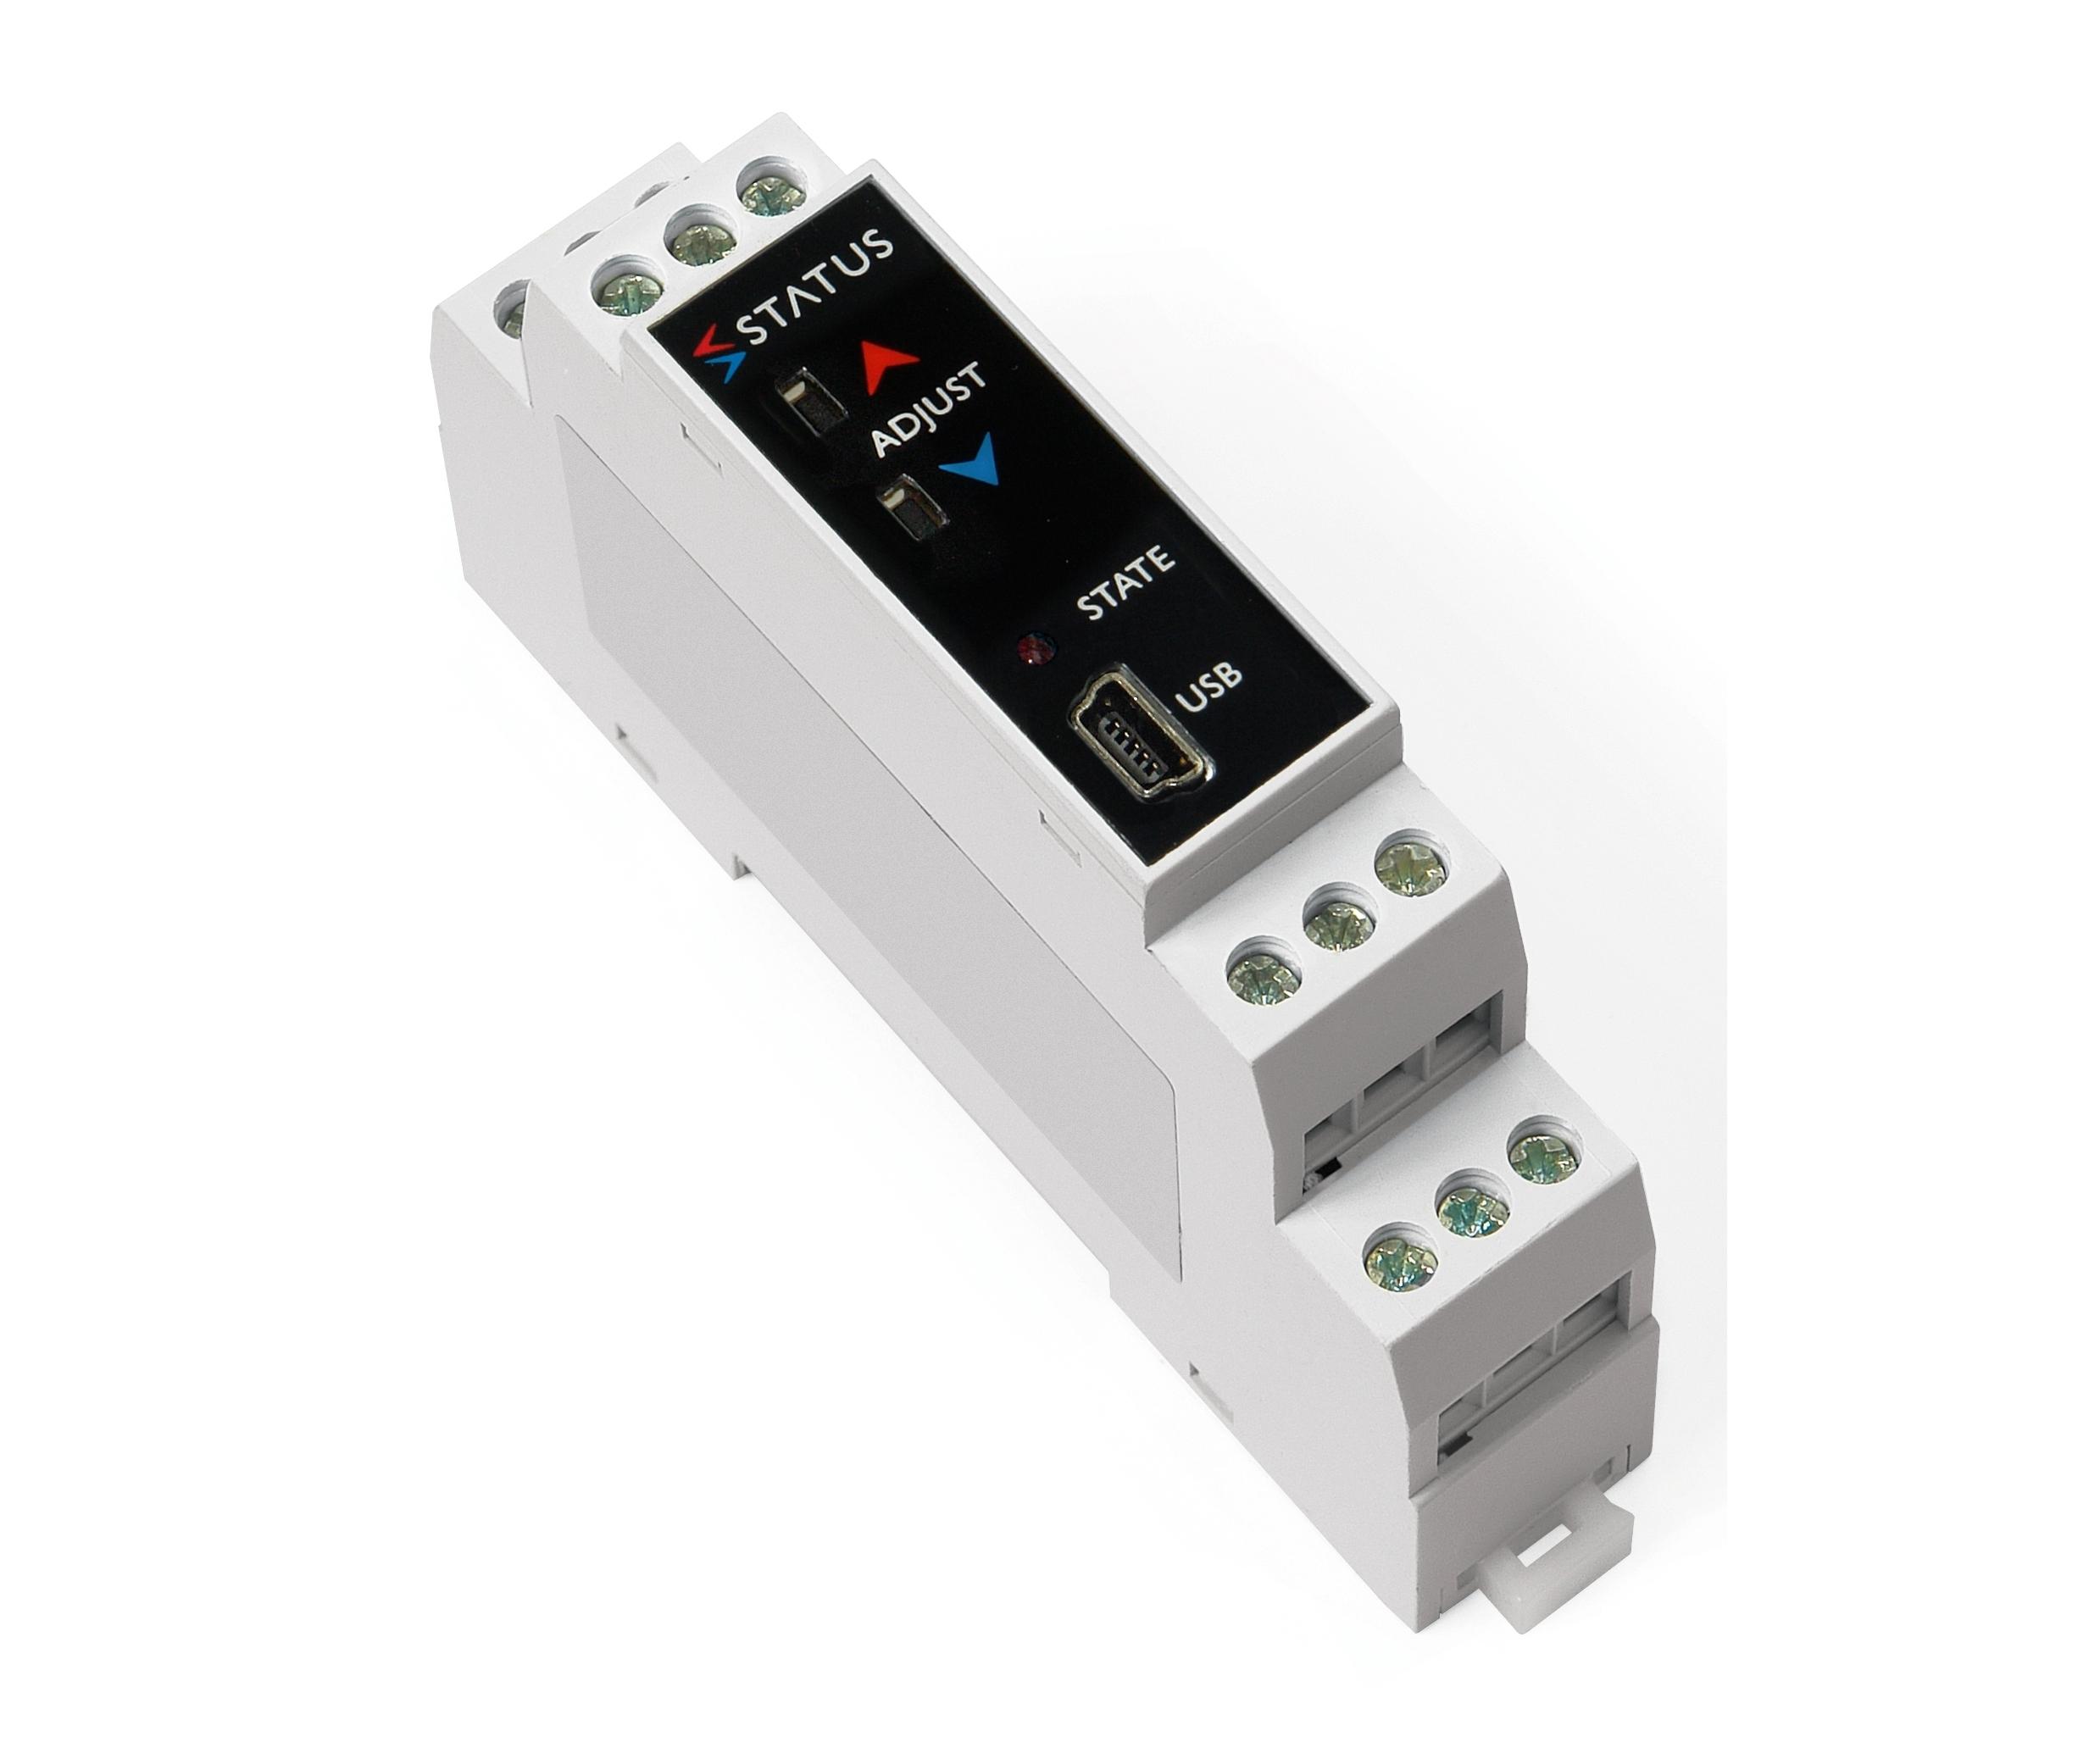 SEM1610 Programmierbare Pt100, Thermoelement, mV und Passive mA.